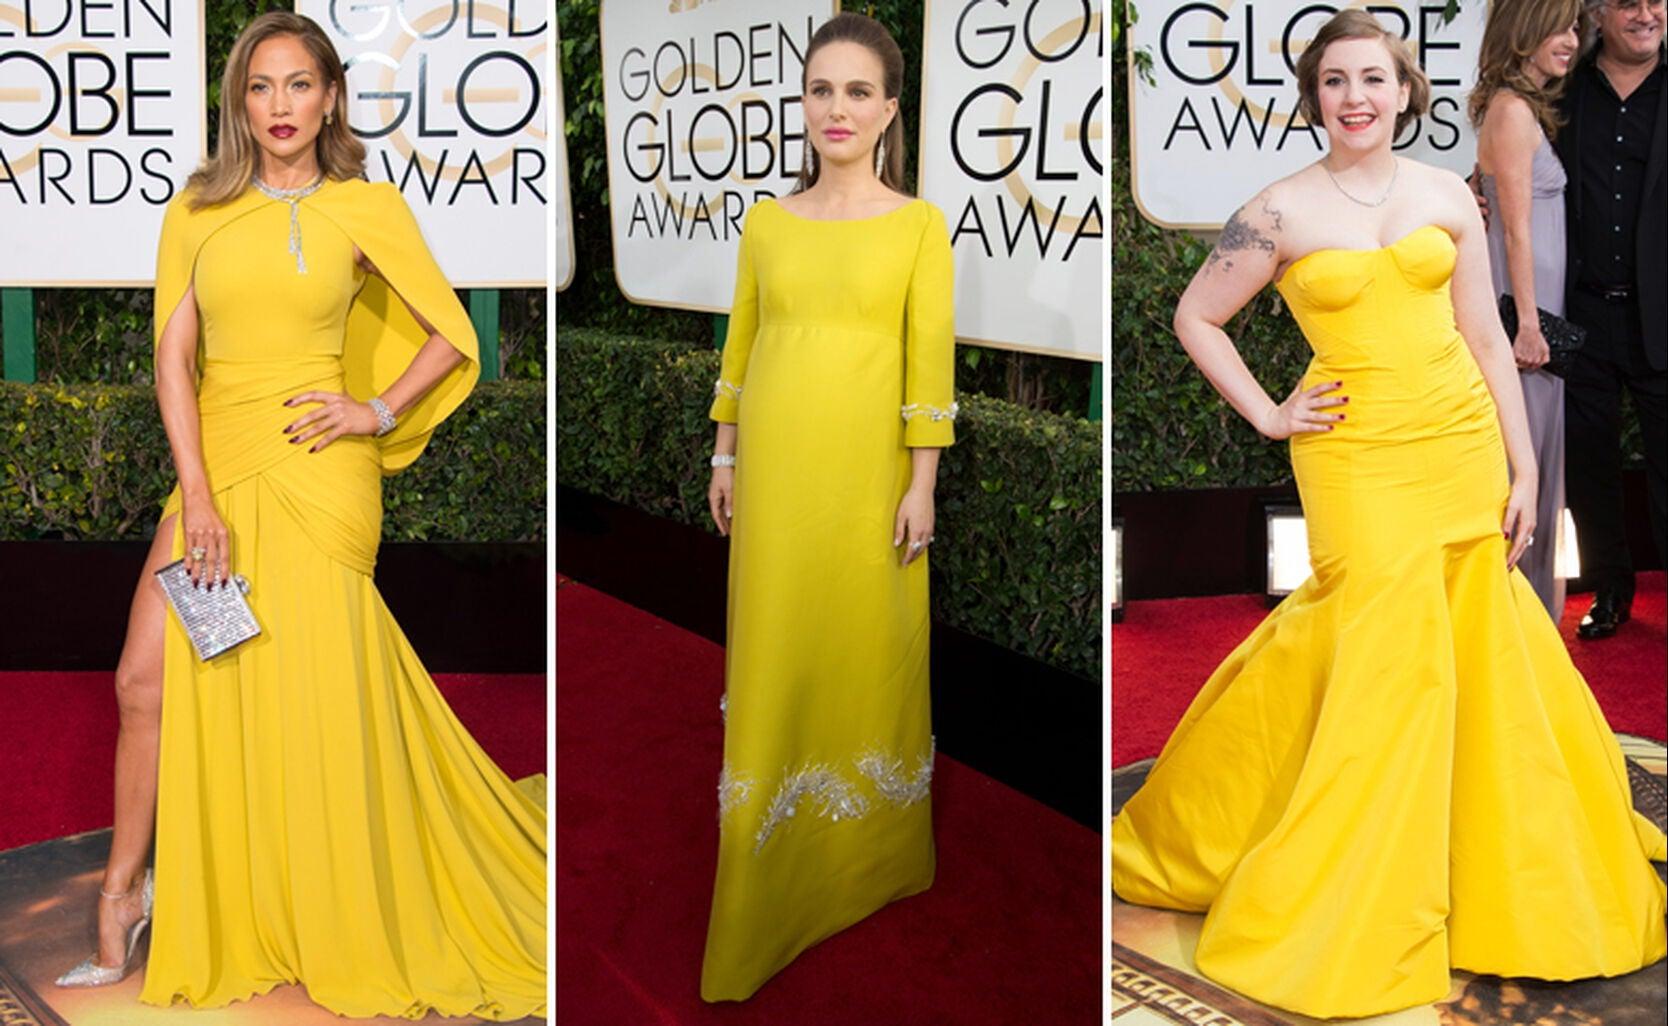 Jennifer Lopez, Natalie Portman and Lena Dunham